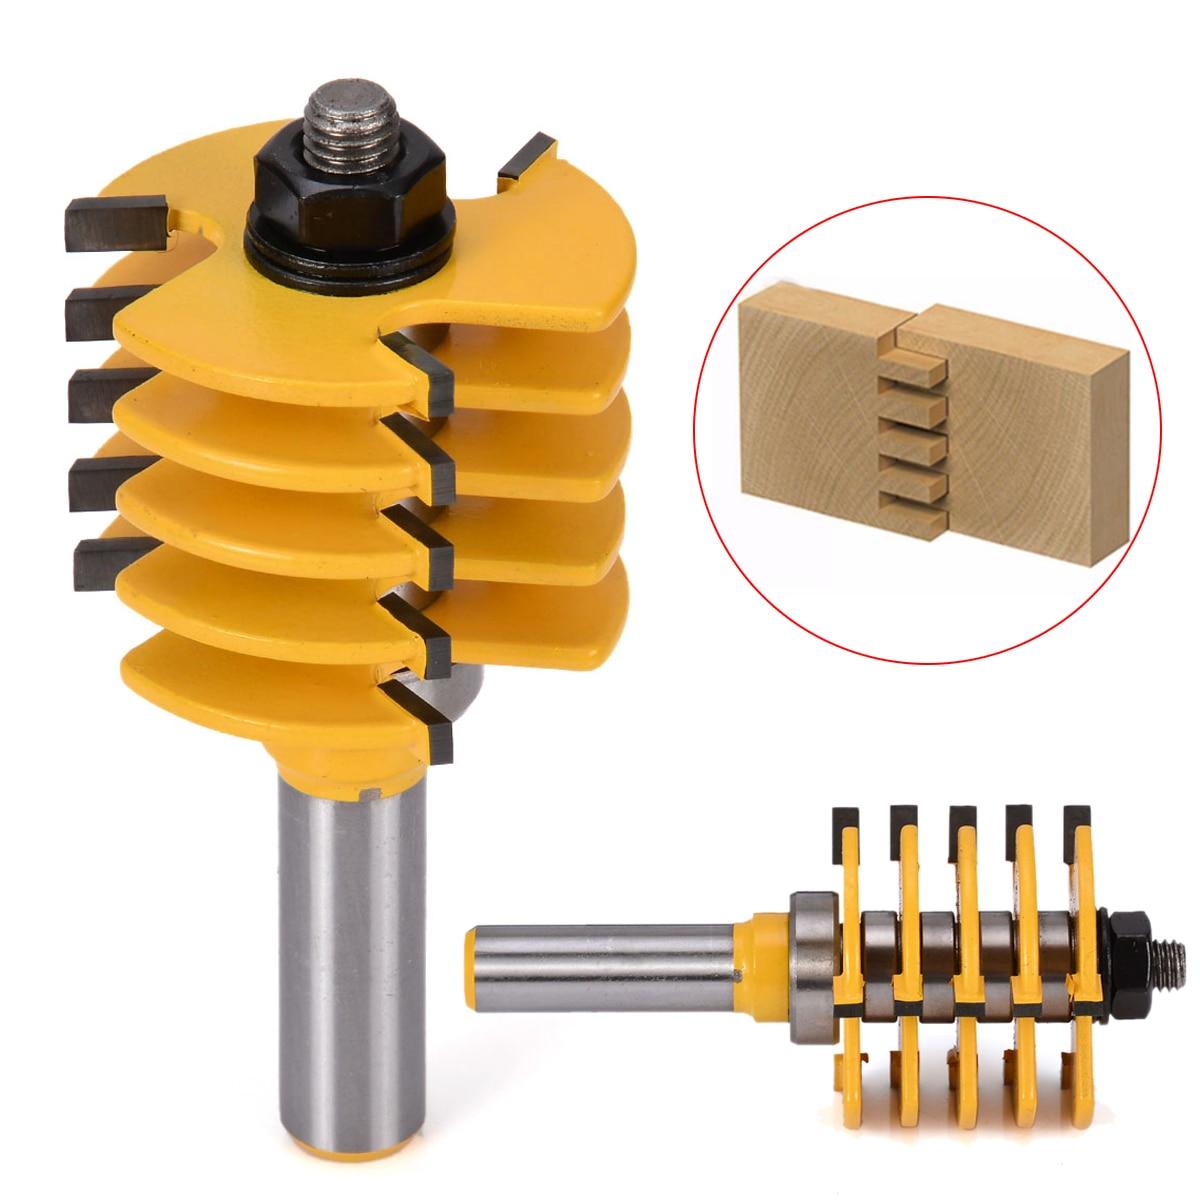 "1/2 ""shank Einstellbar Box & Holz Router Bit Finger Joint Router Bit Holz Fräser Werkzeug StraßEnpreis"